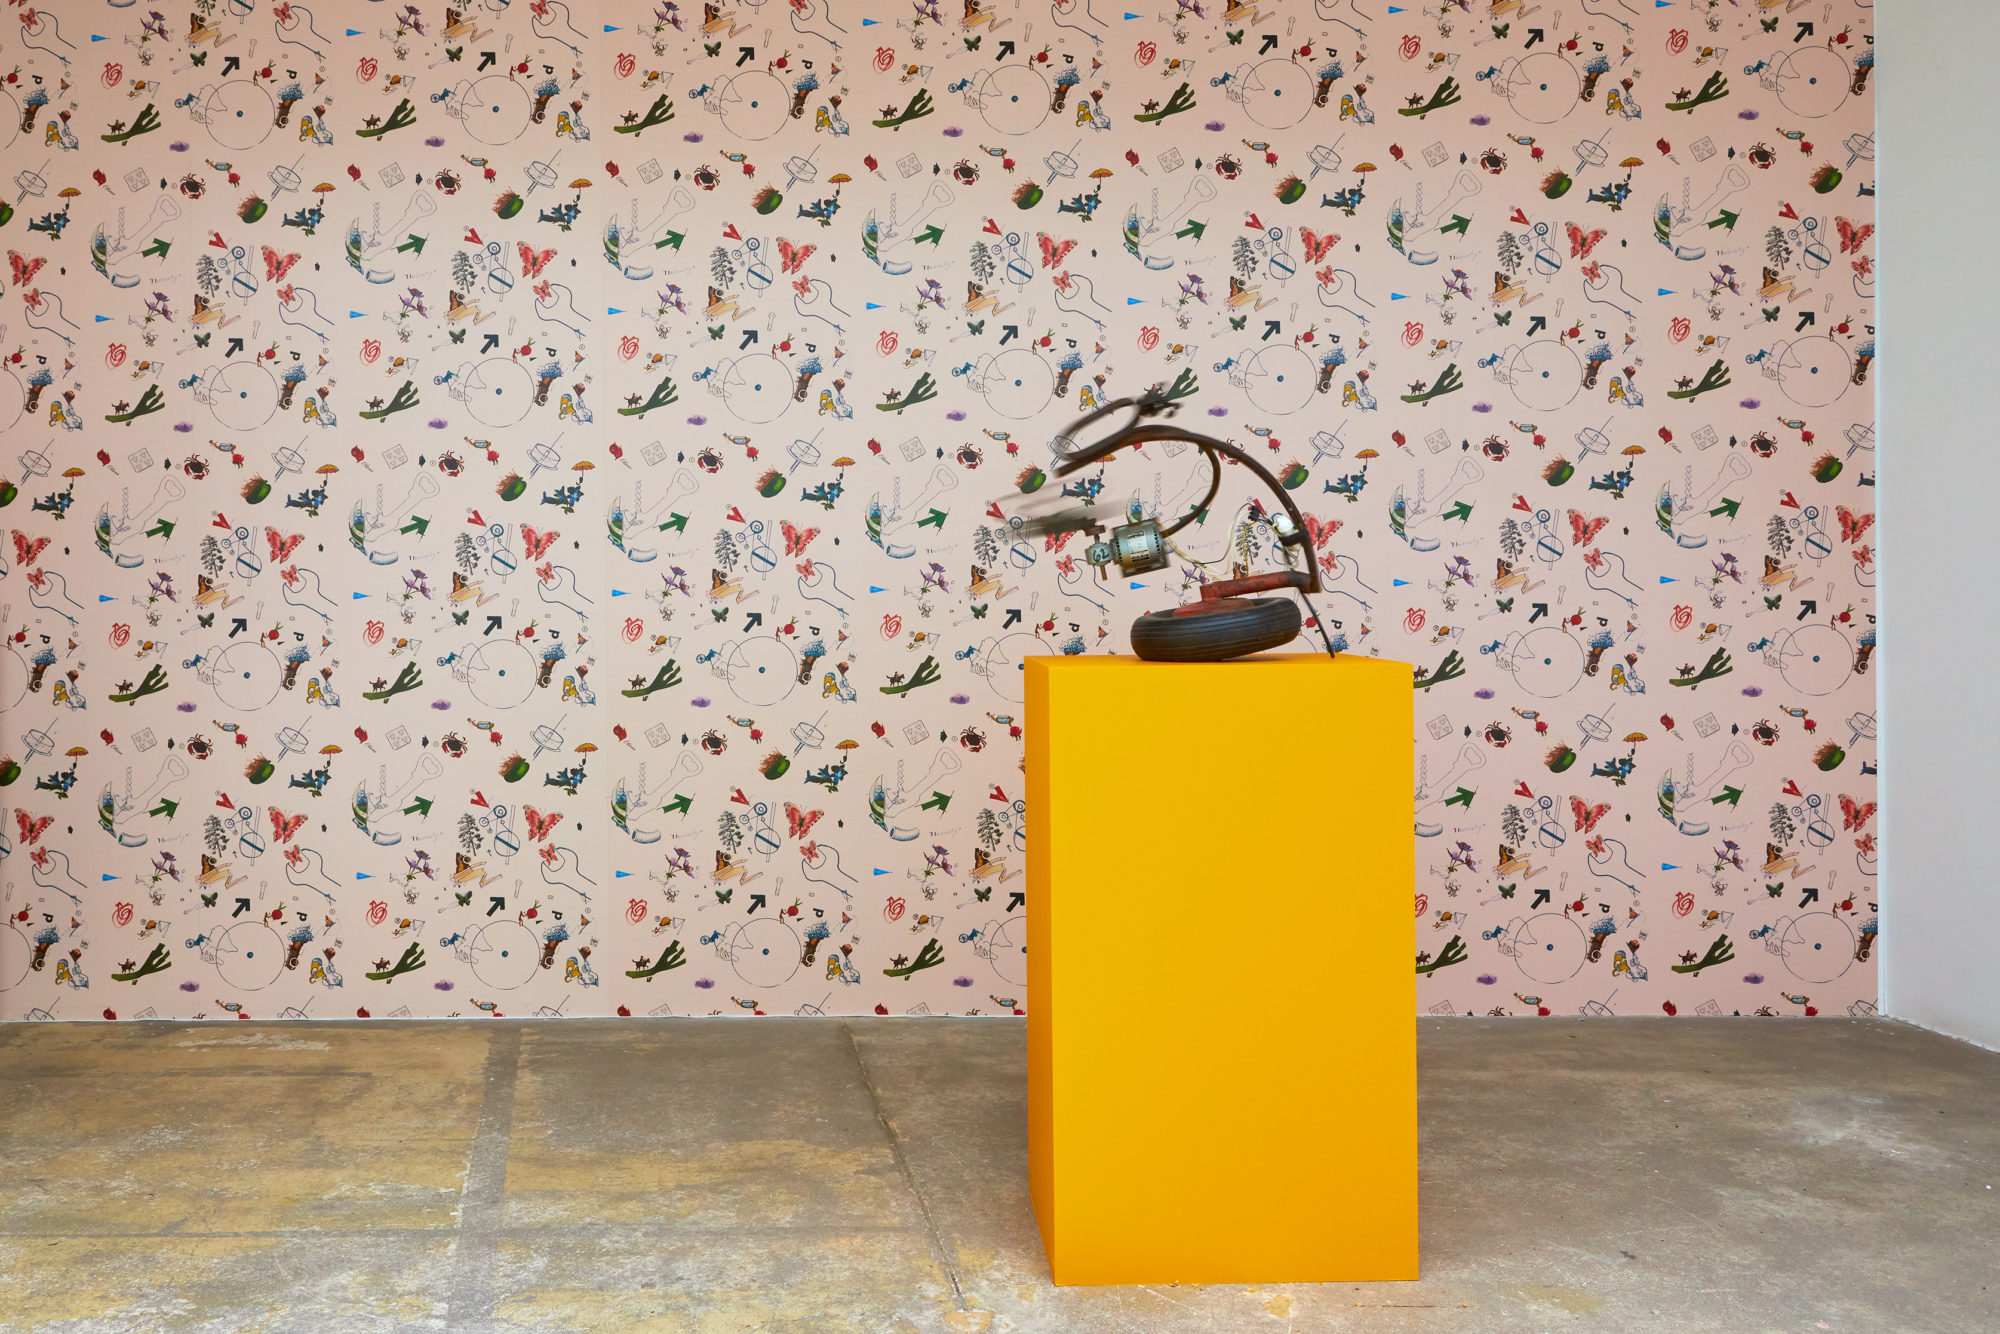 Bricolages et Débri(s)collages - Galerie Georges-Philippe & Nathalie Vallois